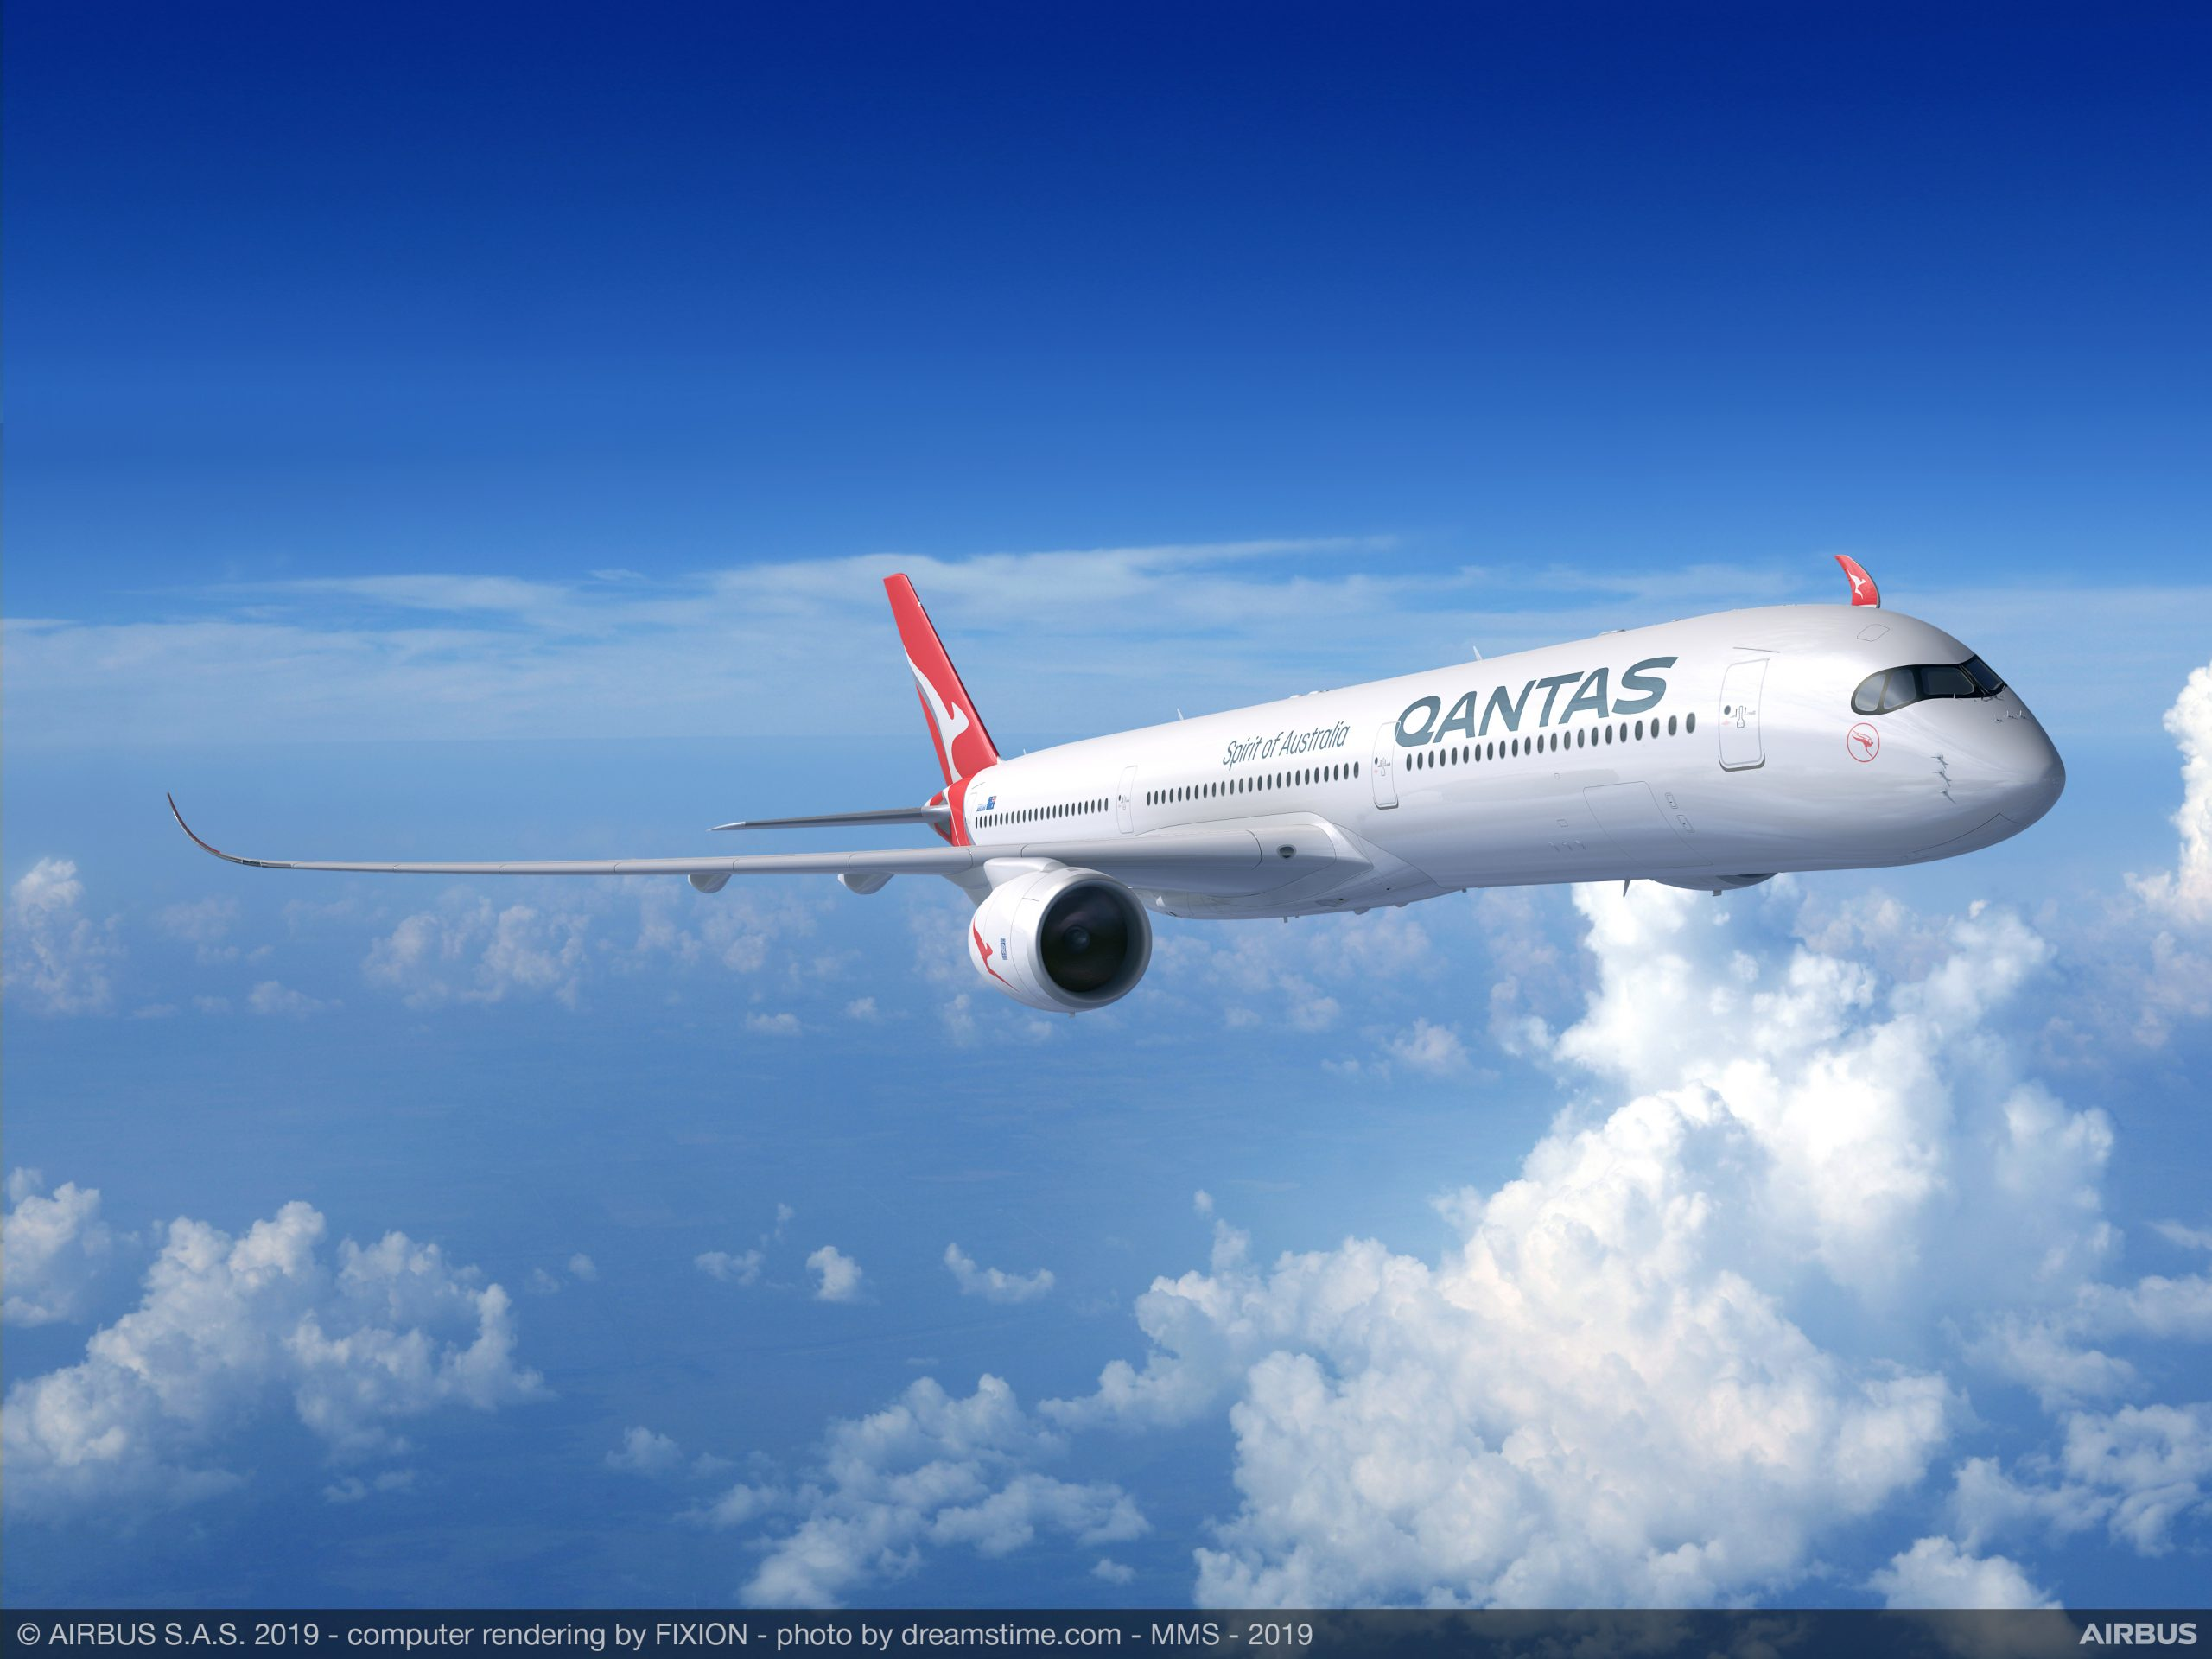 QANTAS Project Sunrise aircraft Selection, Airbus A350-1000